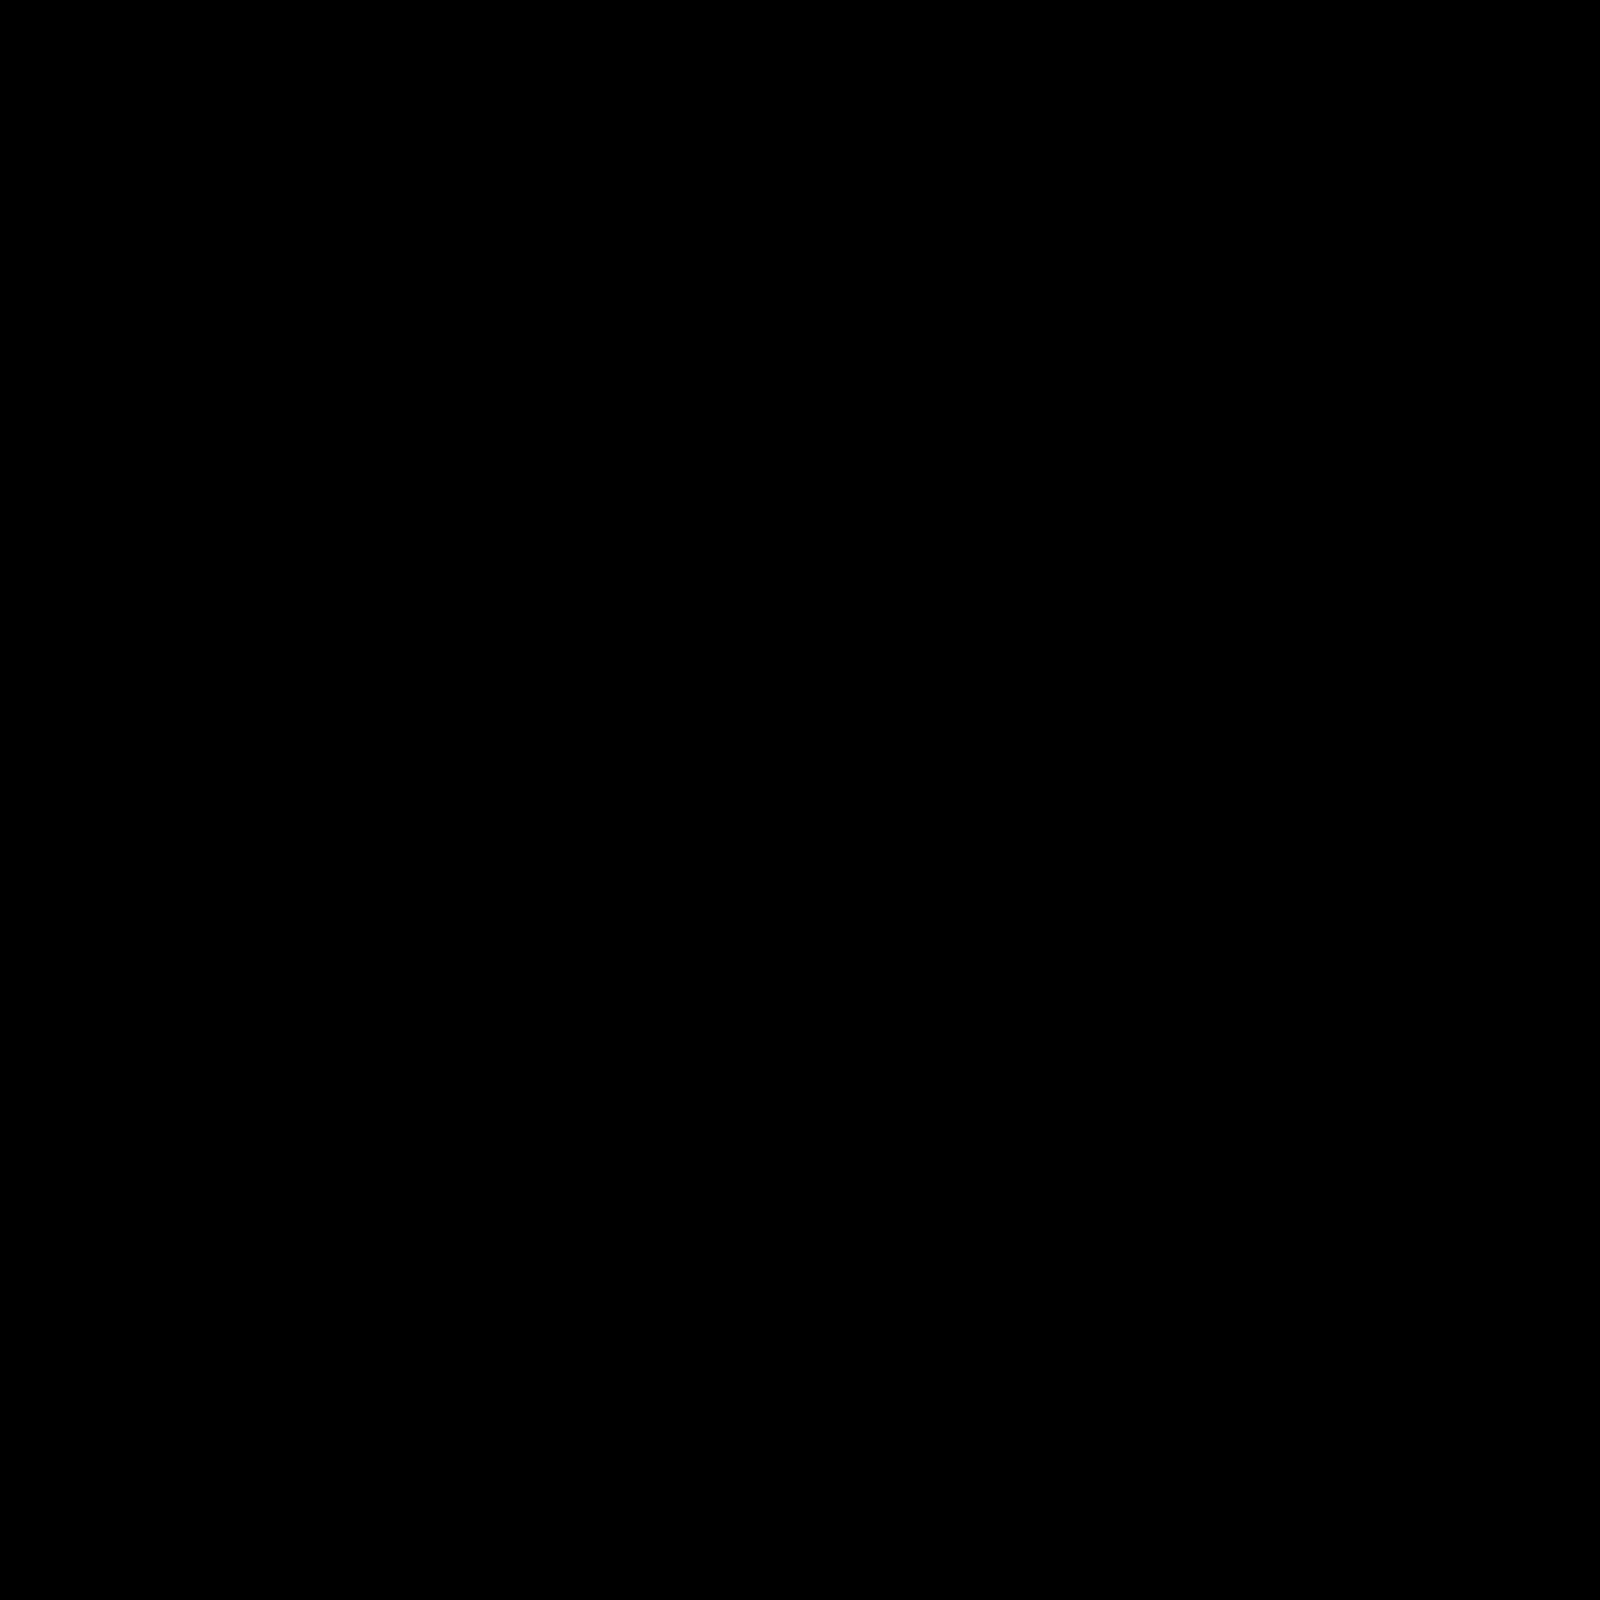 Circled O icon